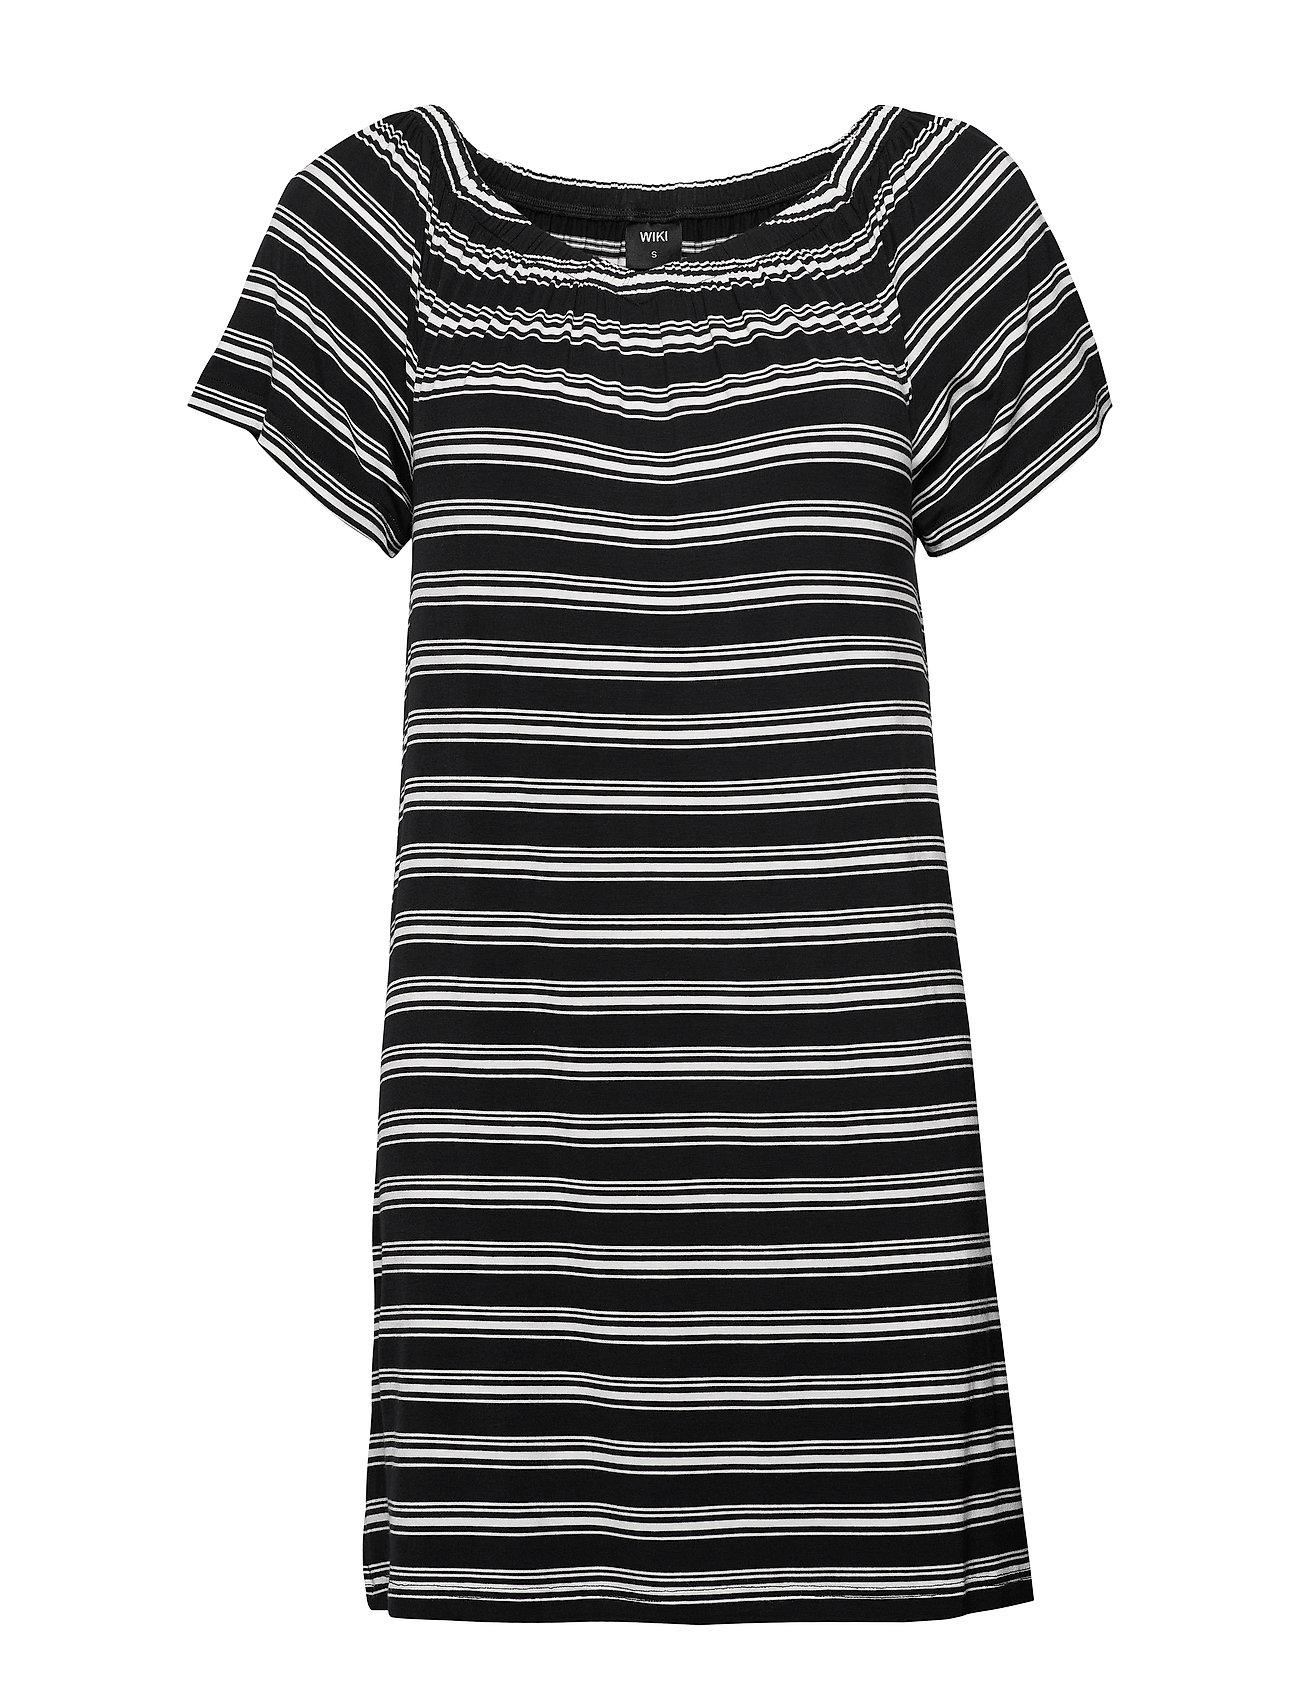 Image of Bamboo Beach Dress Badetøj Sort Wiki (3377374501)